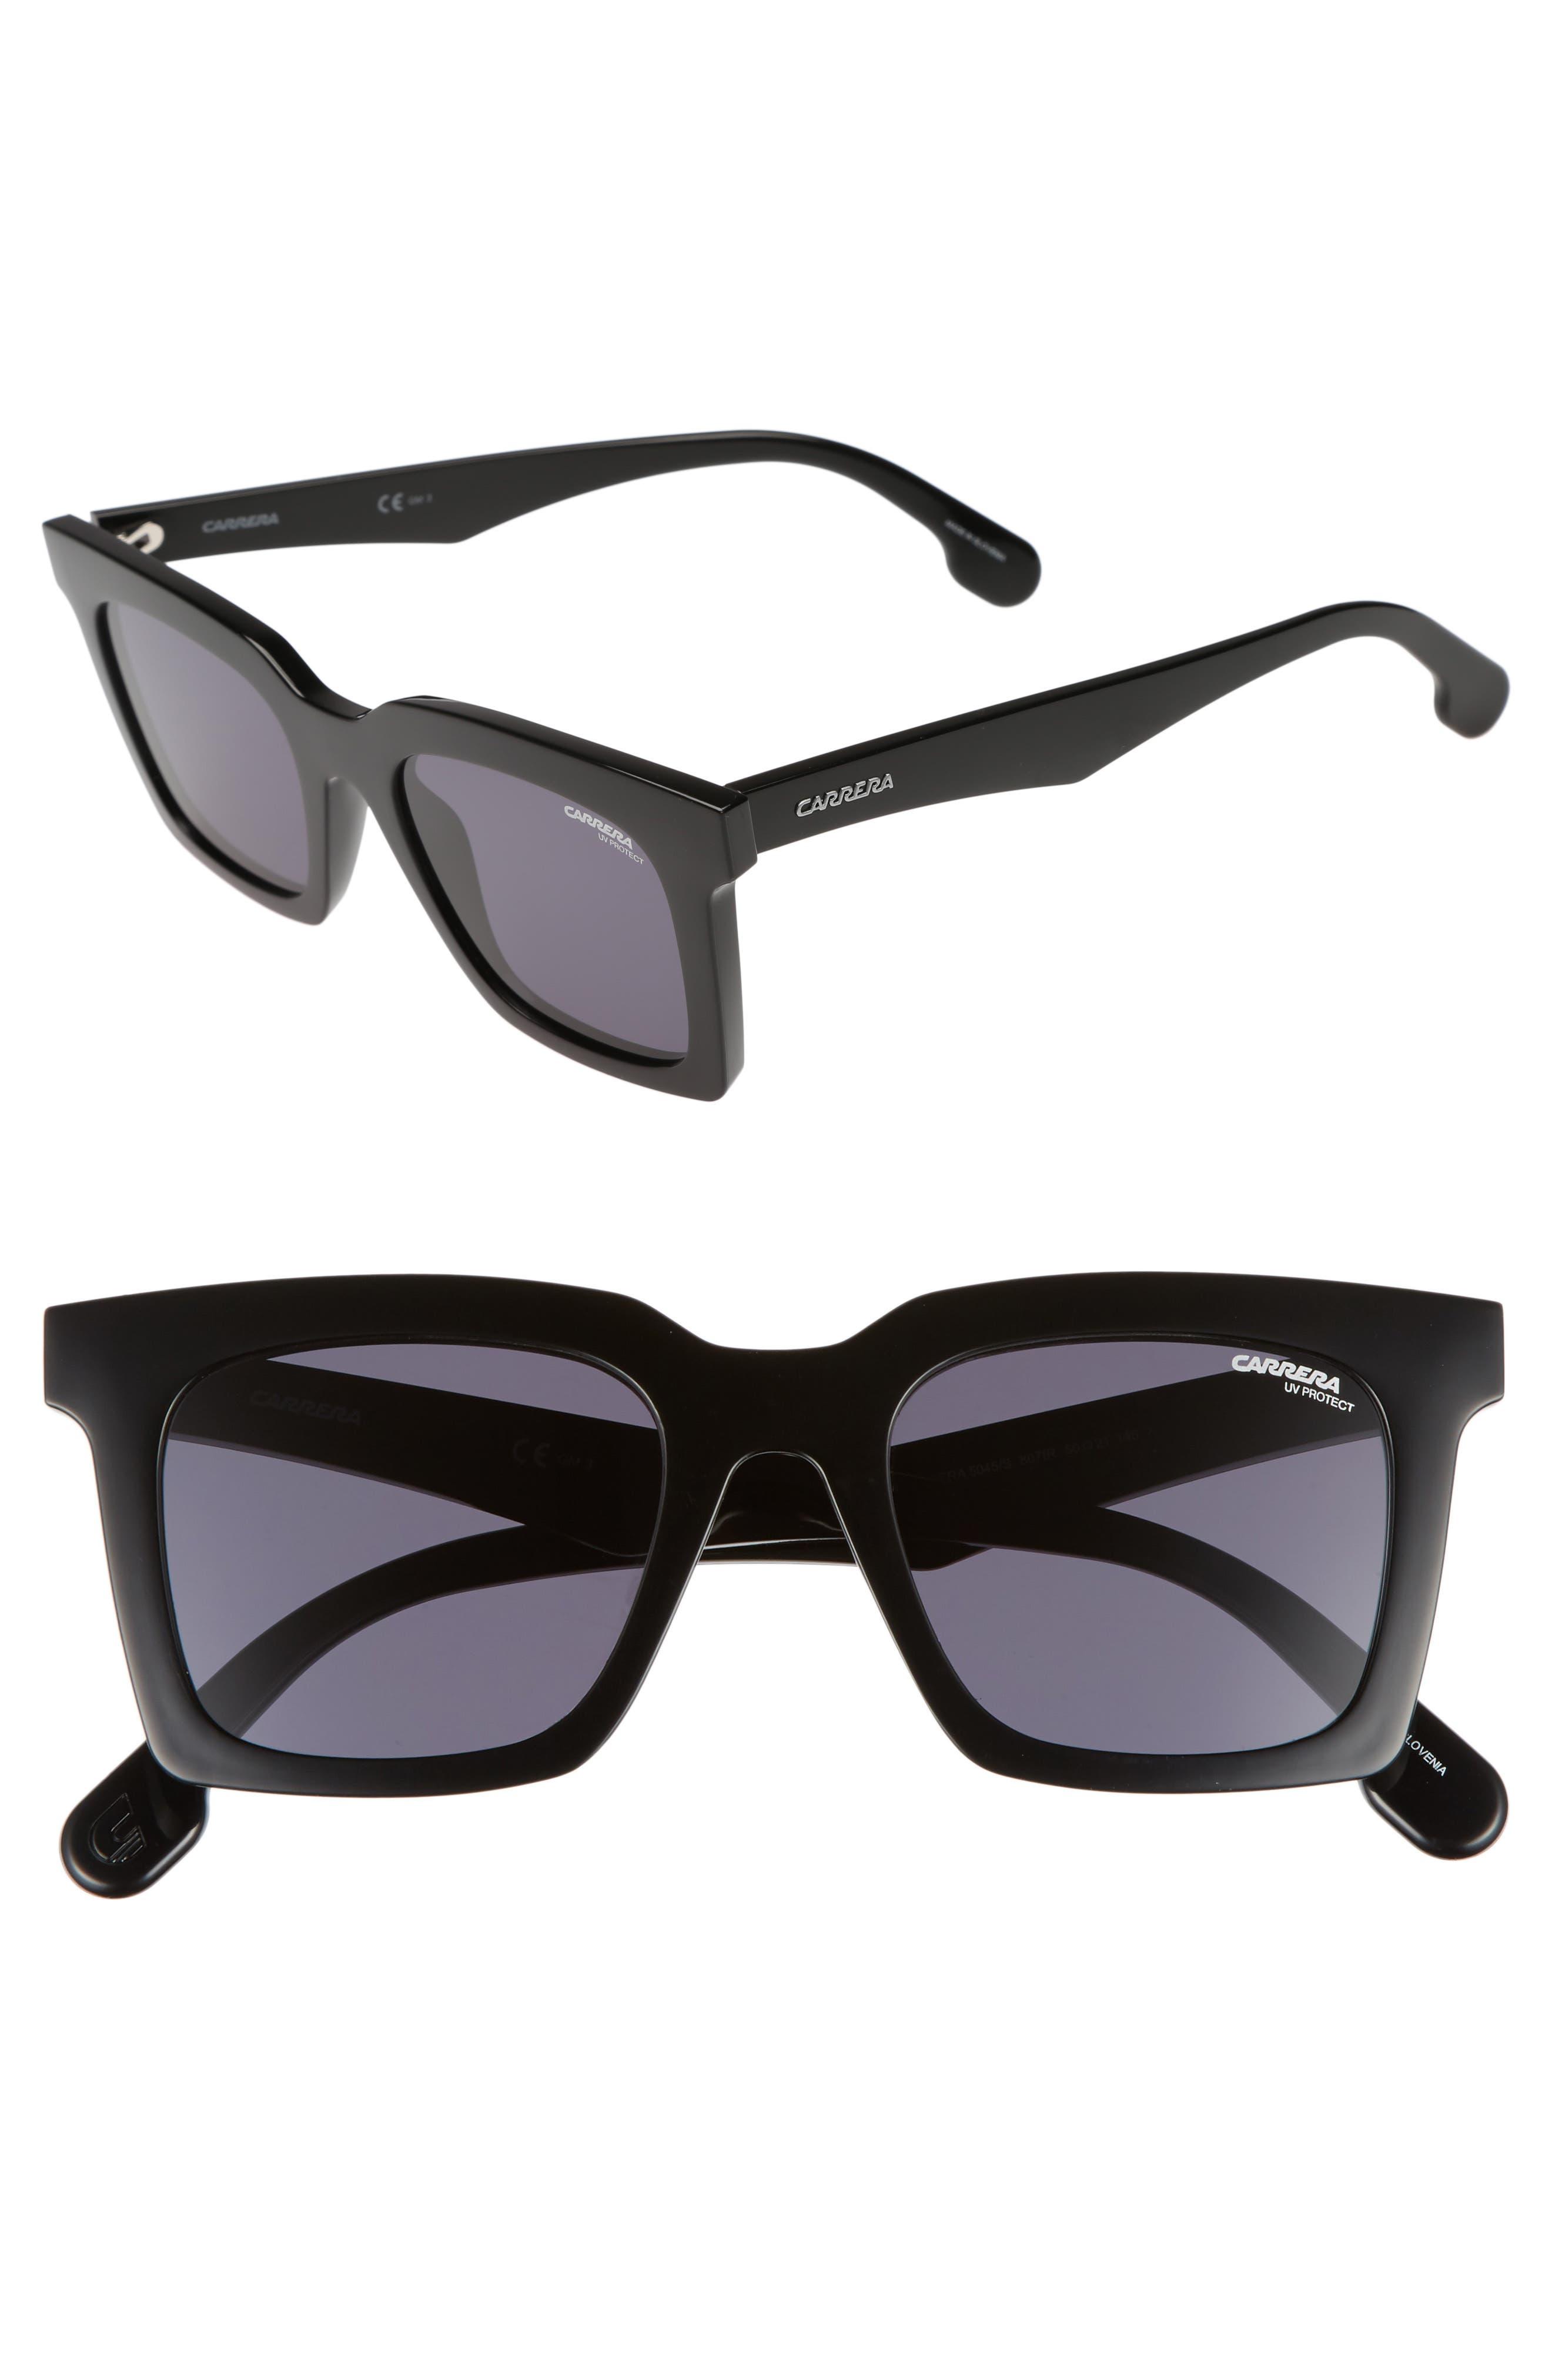 Main Image - Carrera Eyewear 5045S 50mm Sunglasses